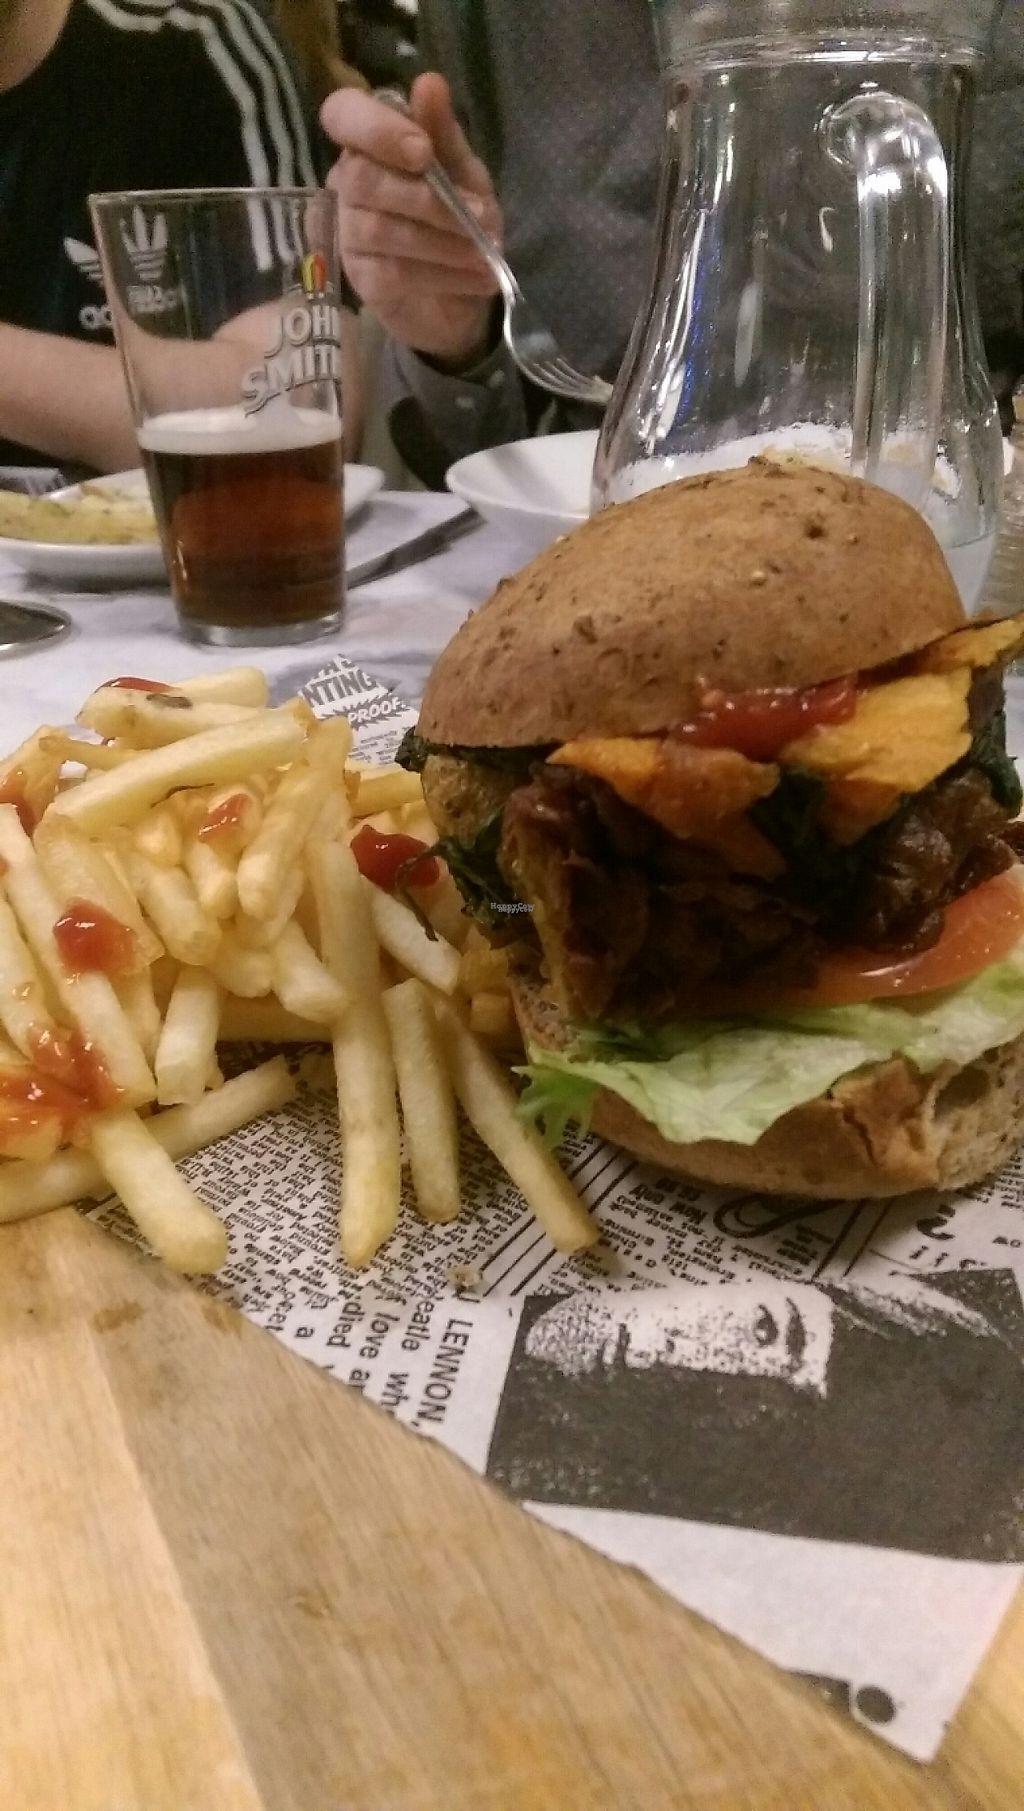 "Photo of Nu Bar  by <a href=""/members/profile/Melissaj1990"">Melissaj1990</a> <br/>epic vegan burger  <br/> December 22, 2016  - <a href='/contact/abuse/image/83820/204145'>Report</a>"